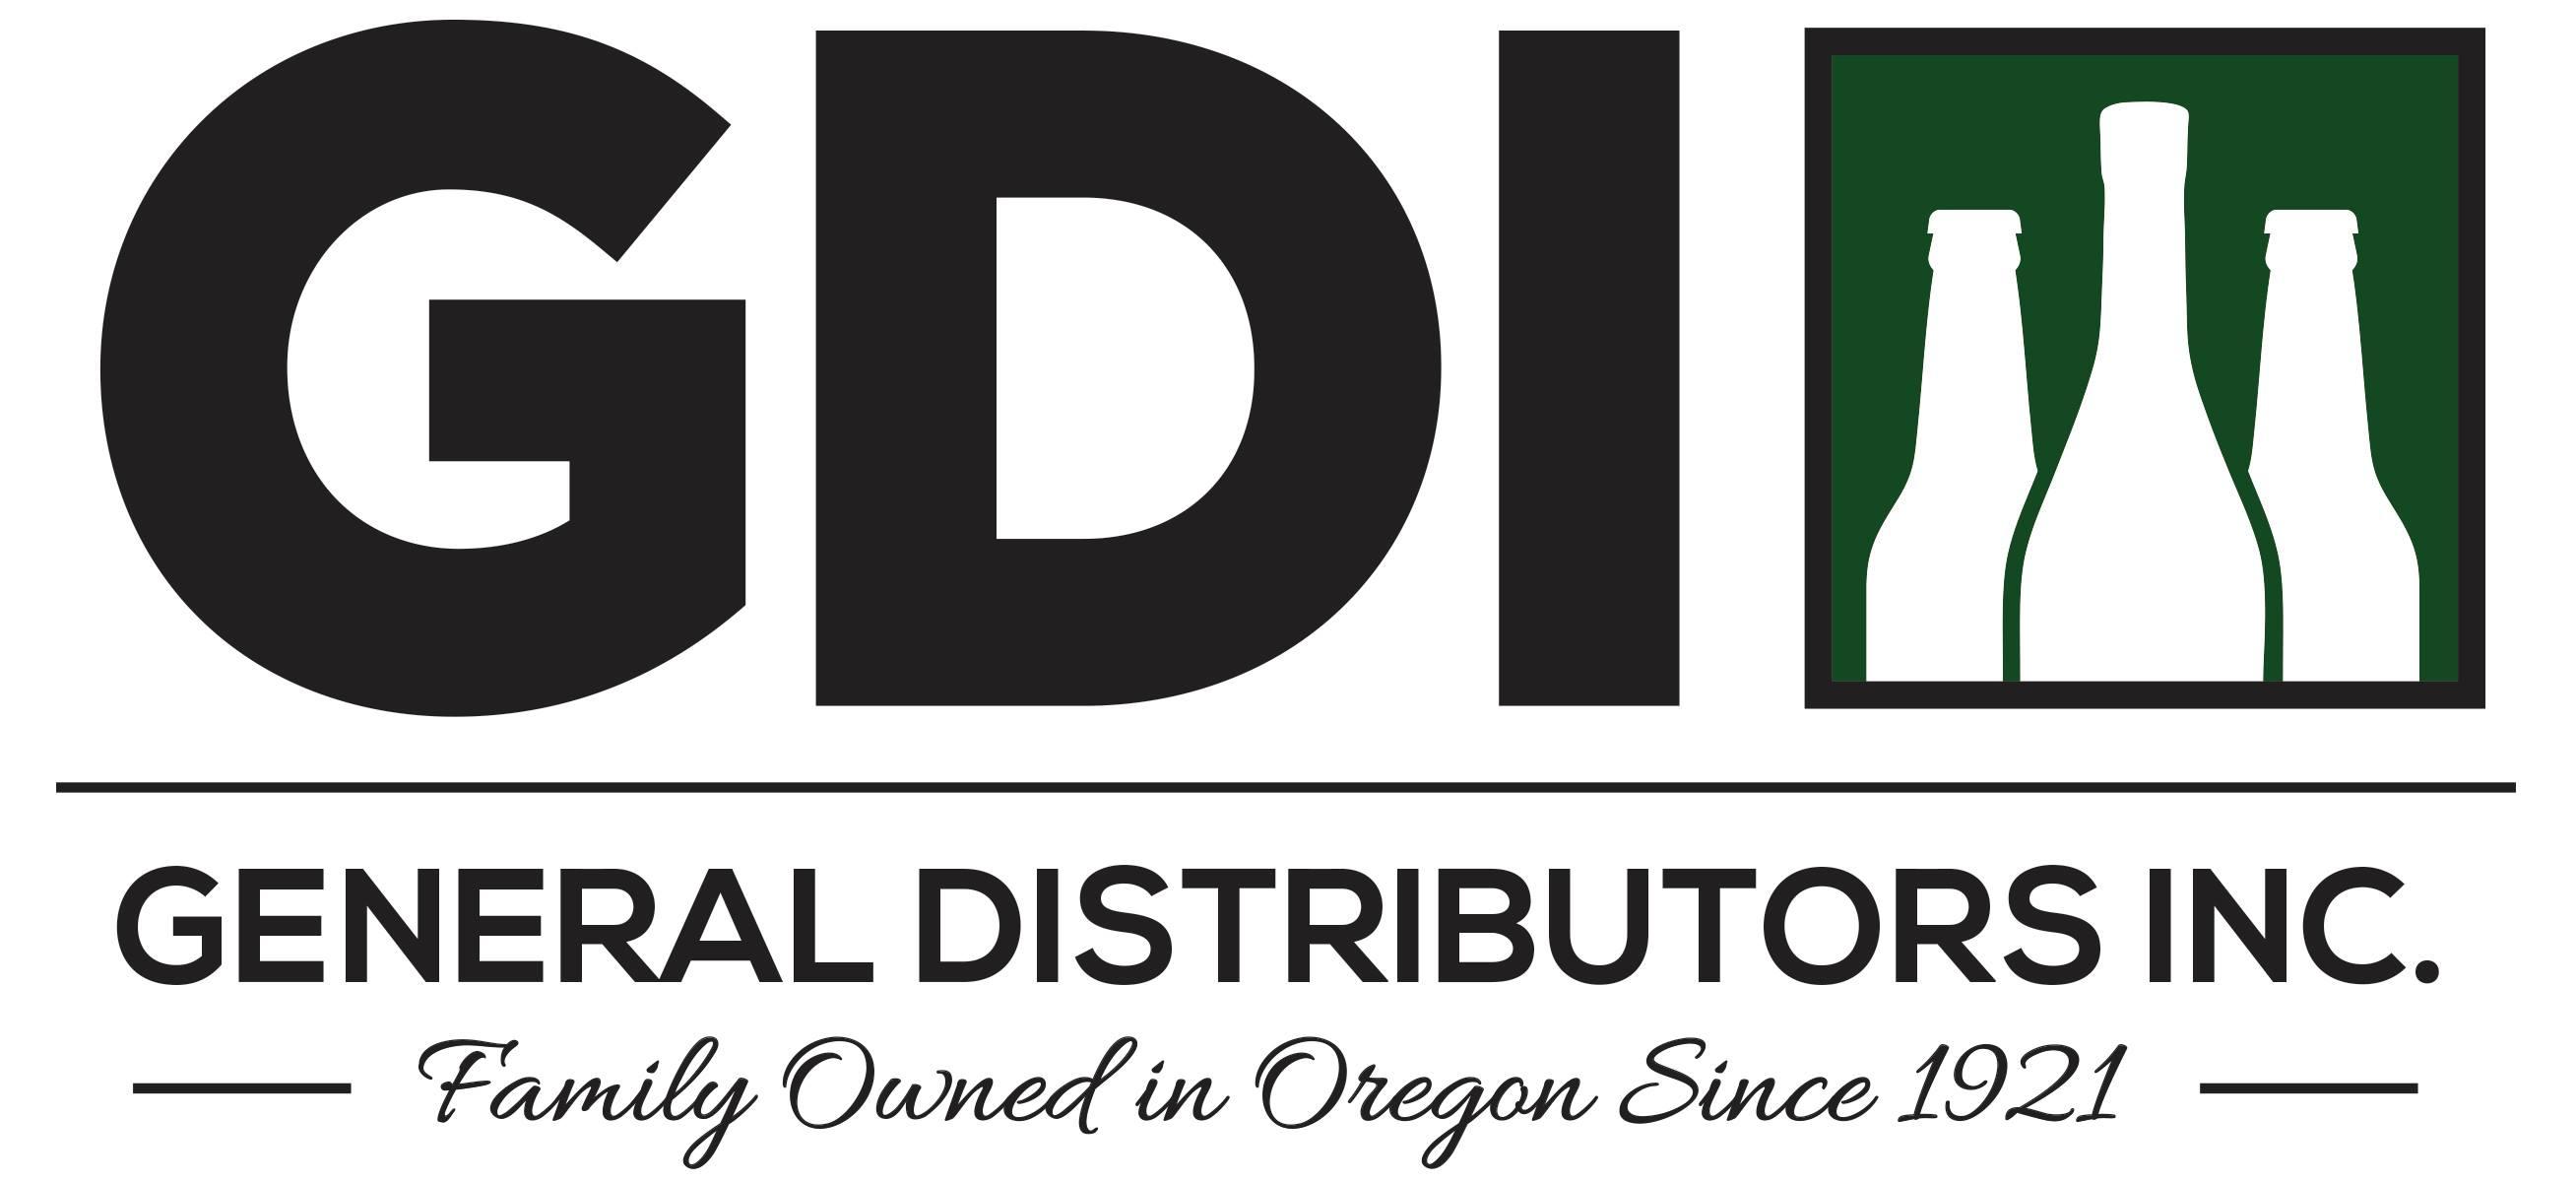 General Distributors Sells to Columbia Distributing